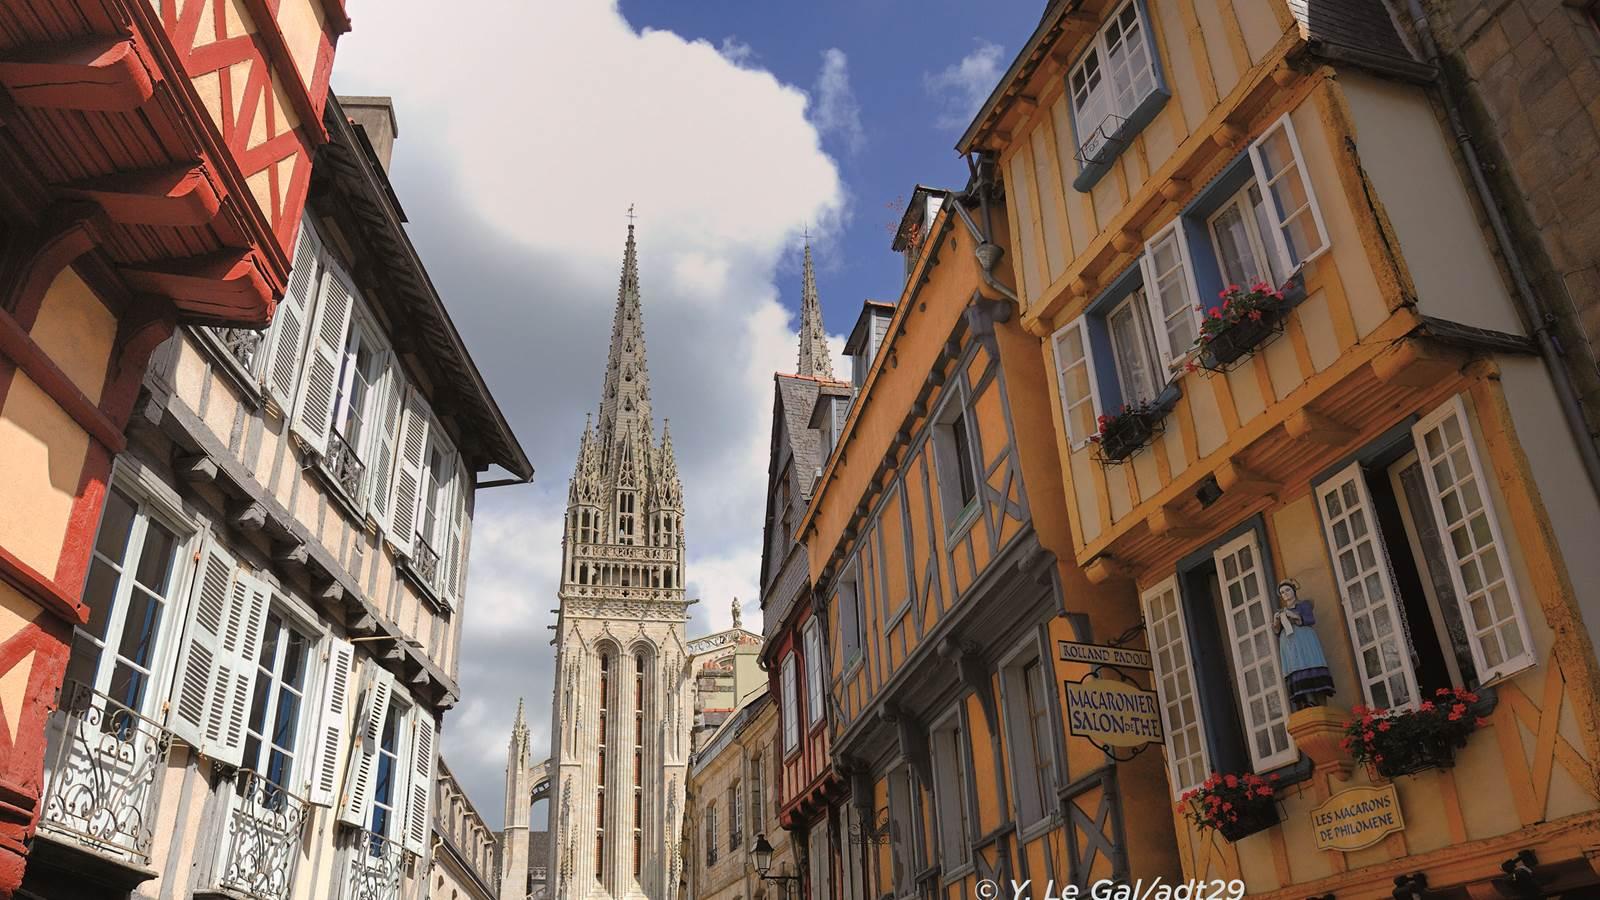 Quimper, capitale de la Cornouaille